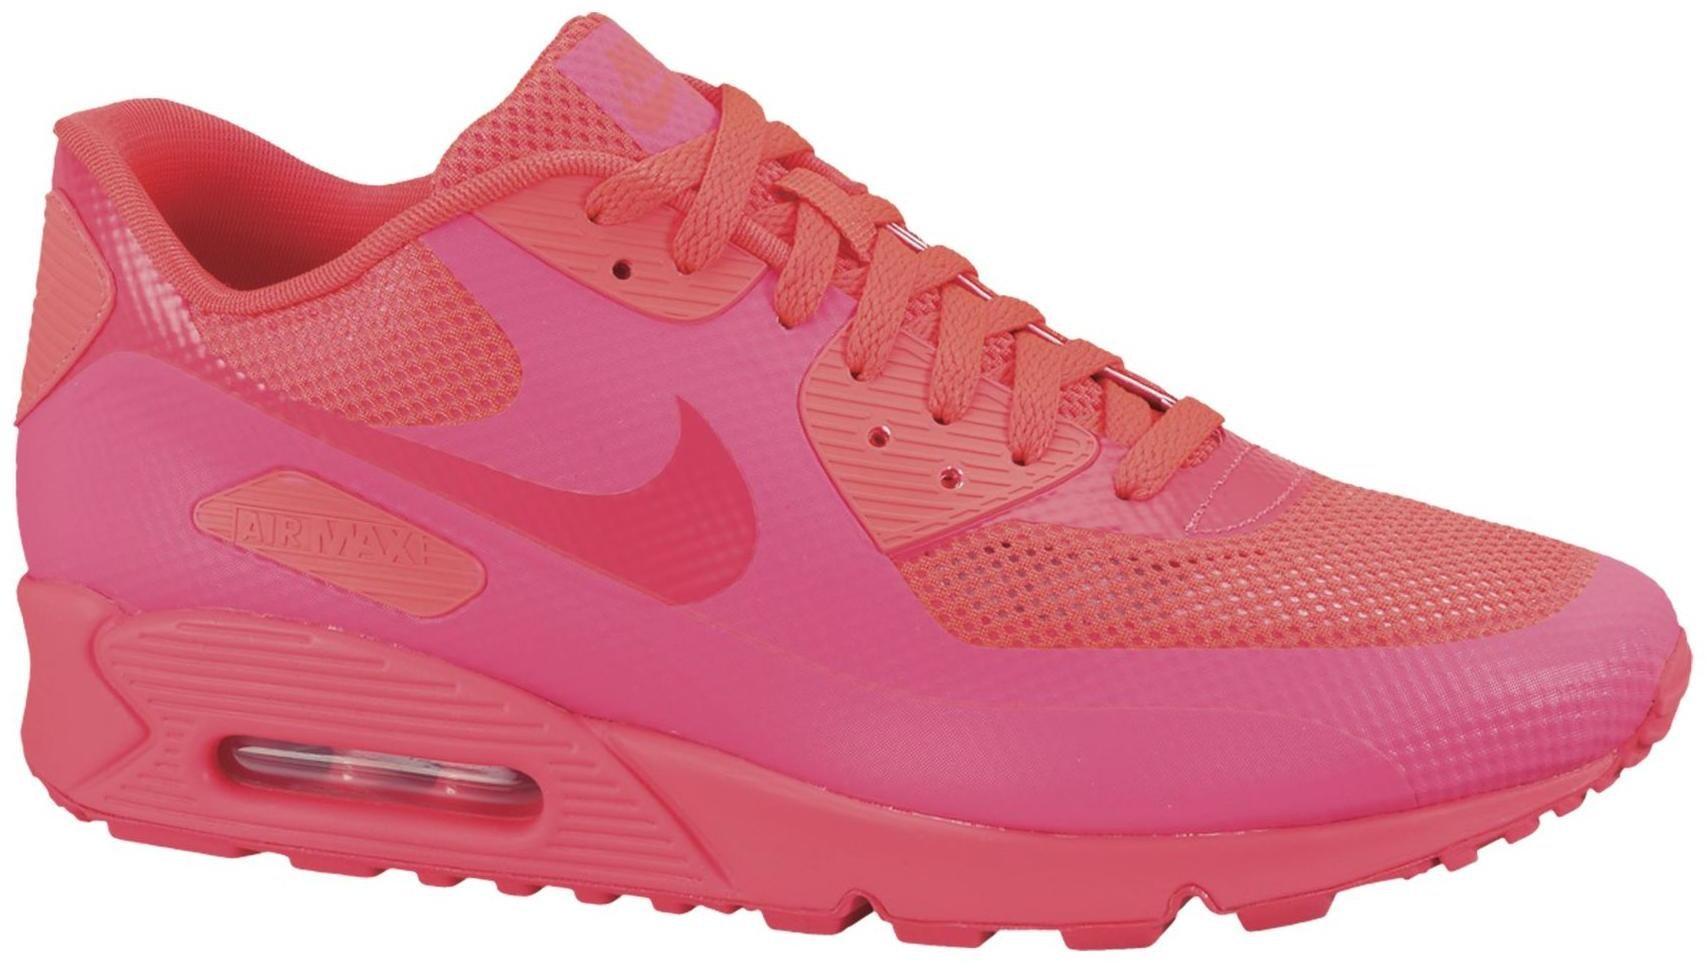 100% Satisfactions nike air max 90 hyperfusesport shoes100% Originalhot sale onlineBA291